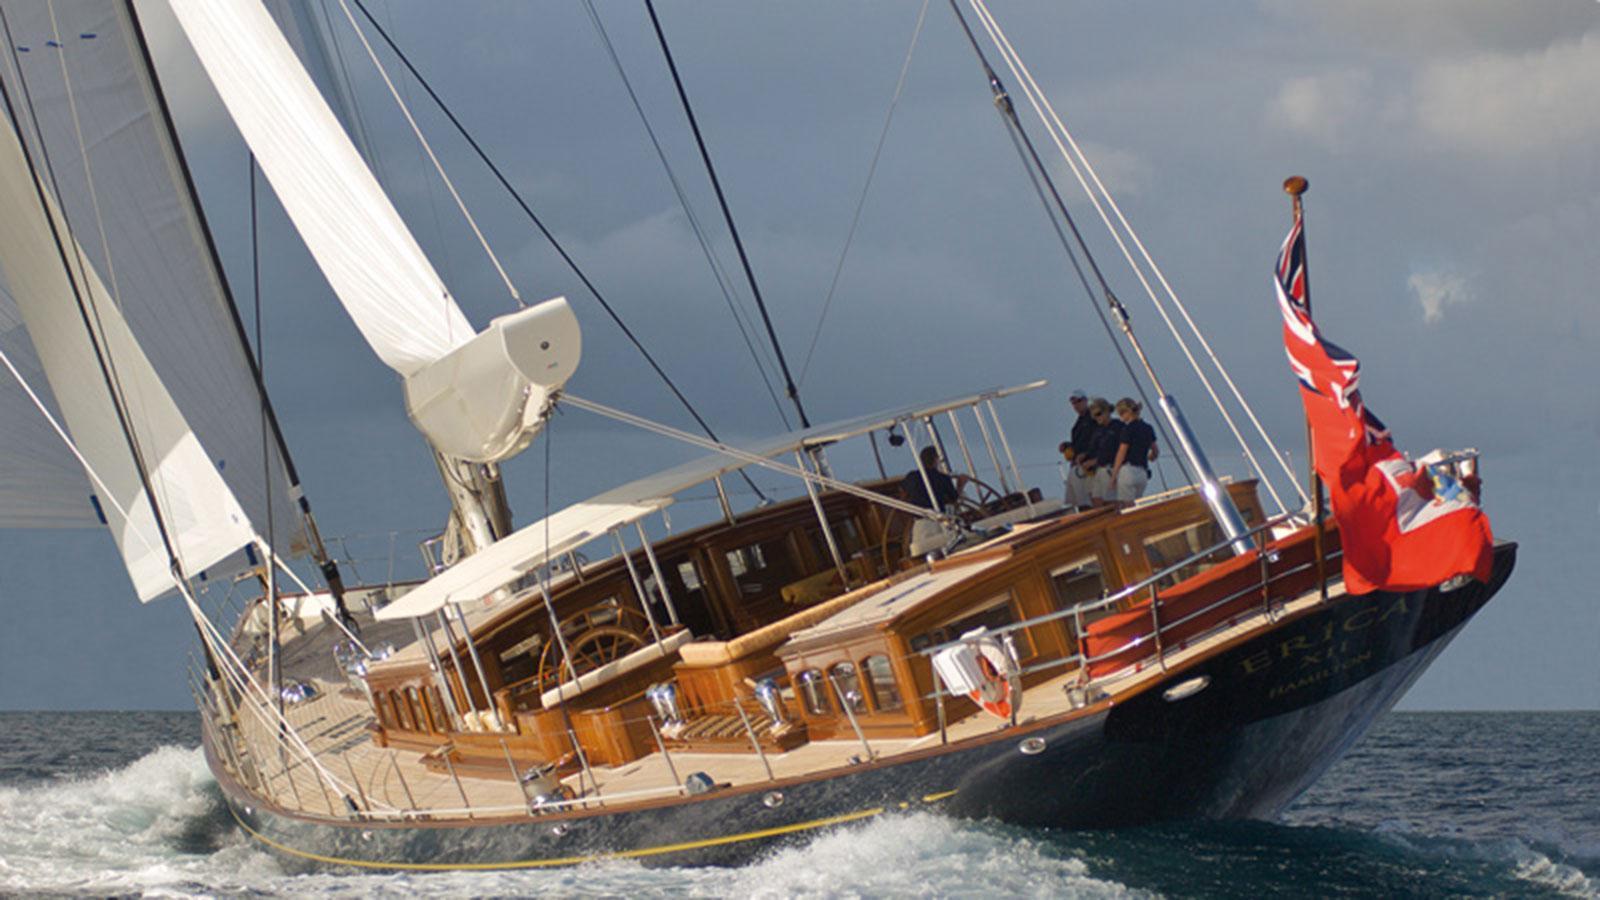 sailing-boat-erica-xii